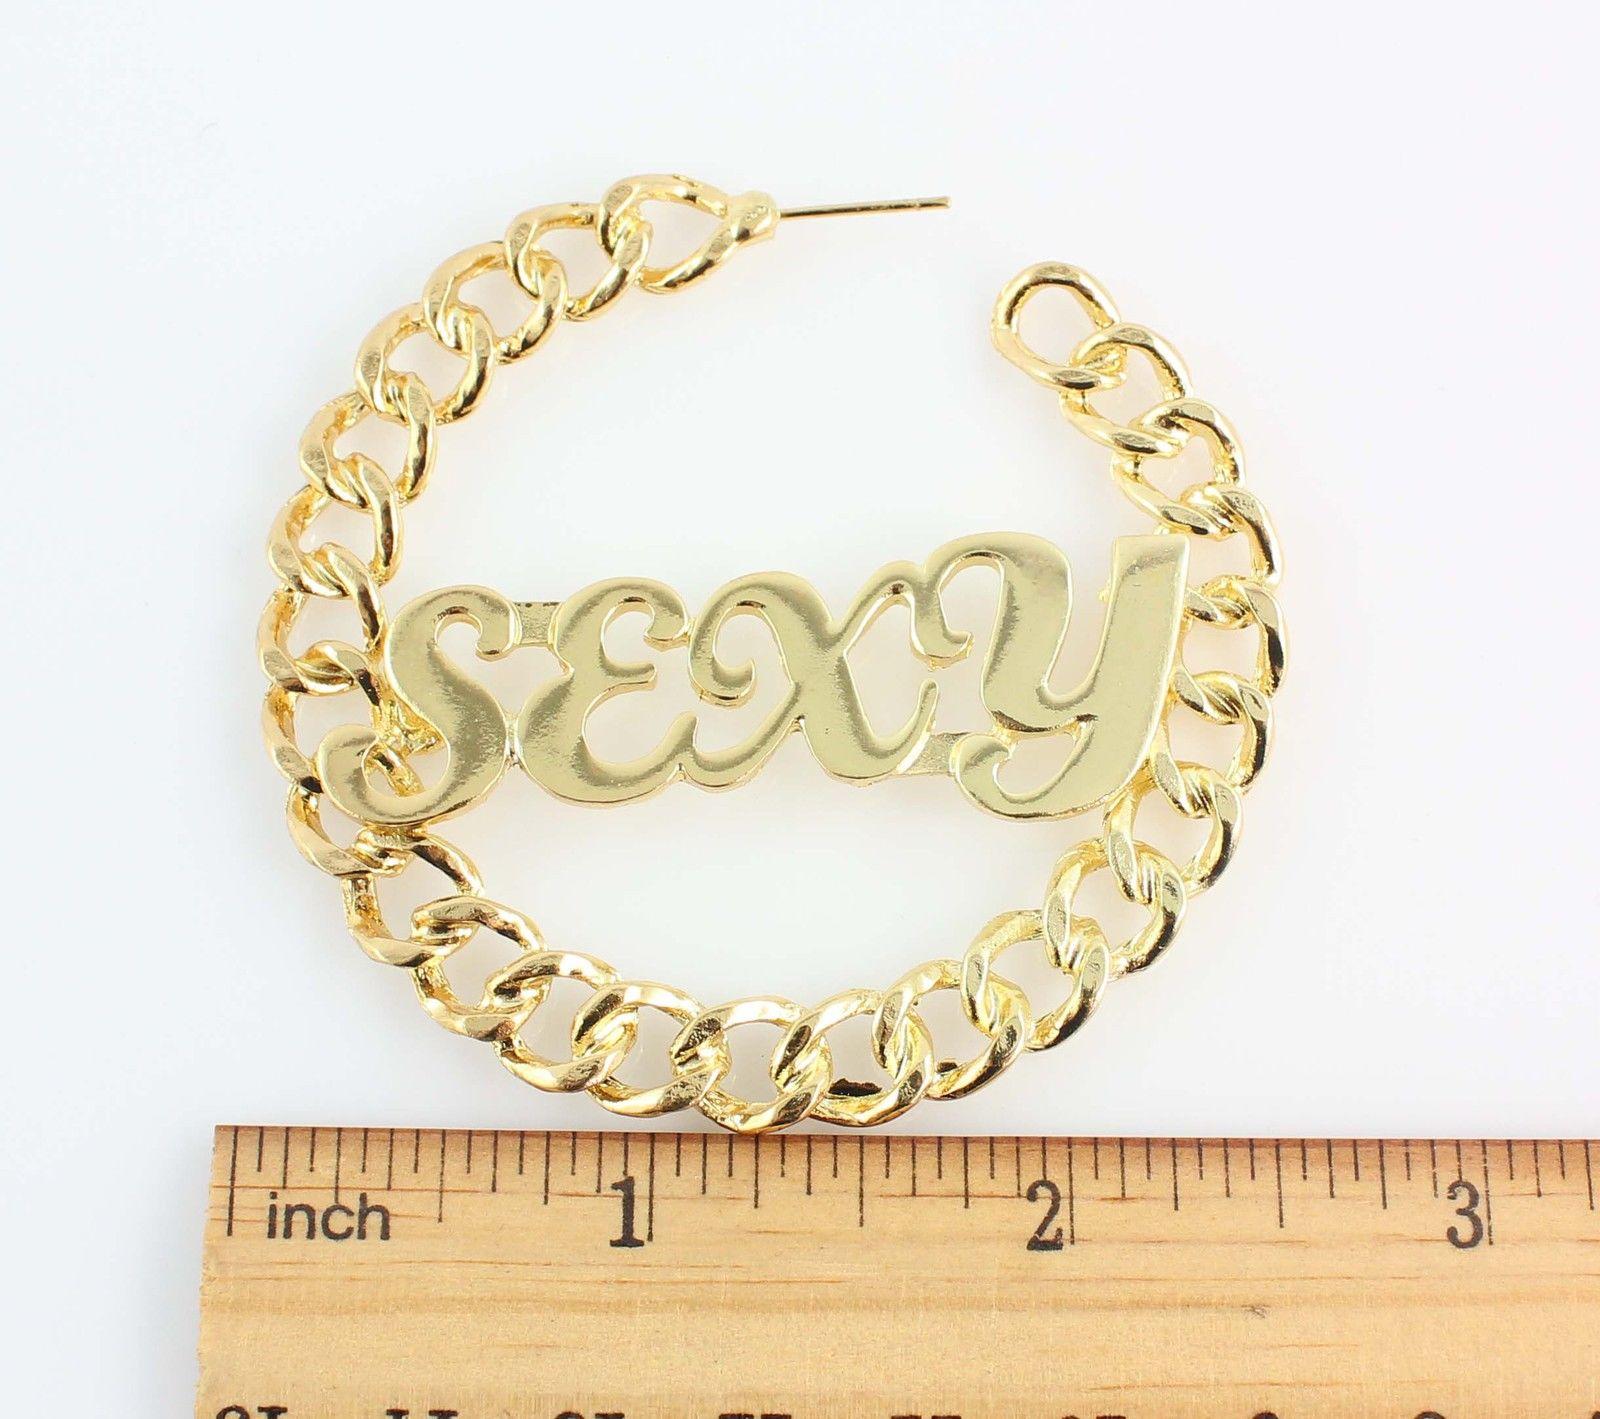 "6 5cm Trendy Gold Tone ""Sexy""Curb Chain Hoop Earrings Hip Hop Jewelry | eBay"